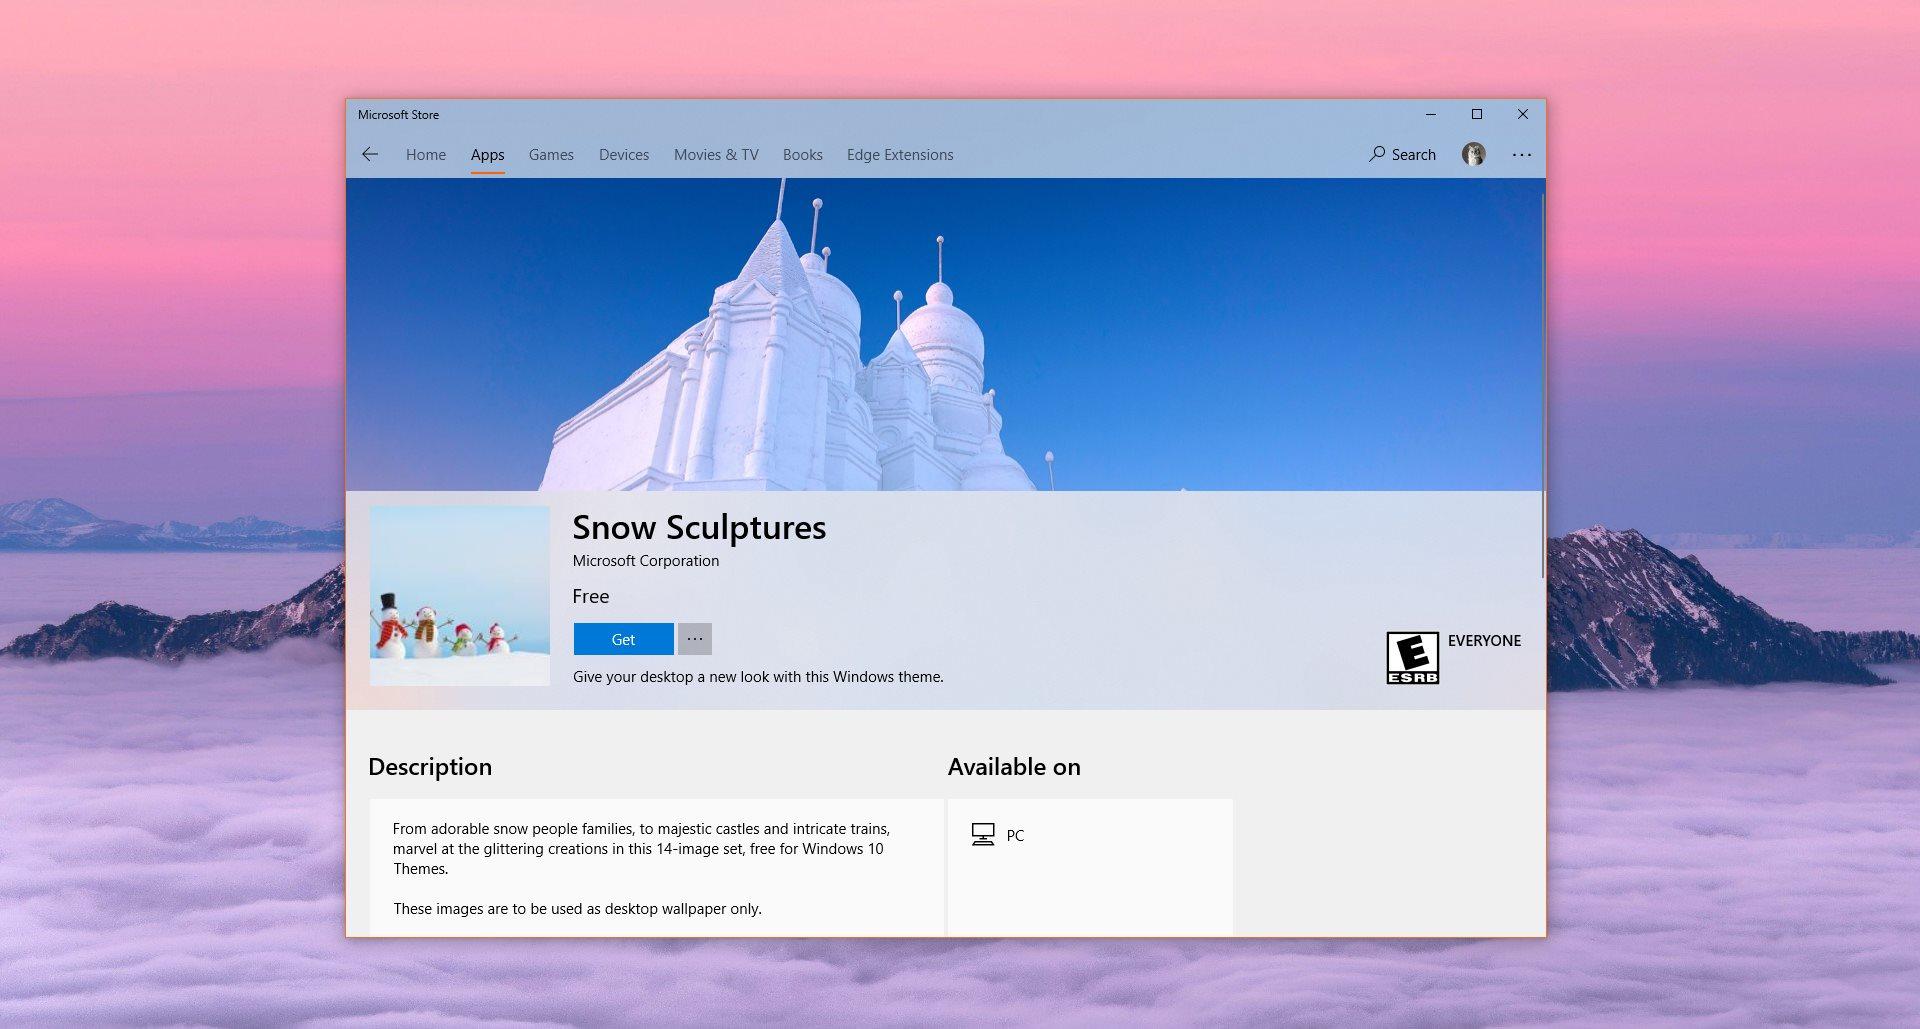 Windows 10 Wallpaper Pack: Microsoft Releases Three New Wallpaper Packs For Windows